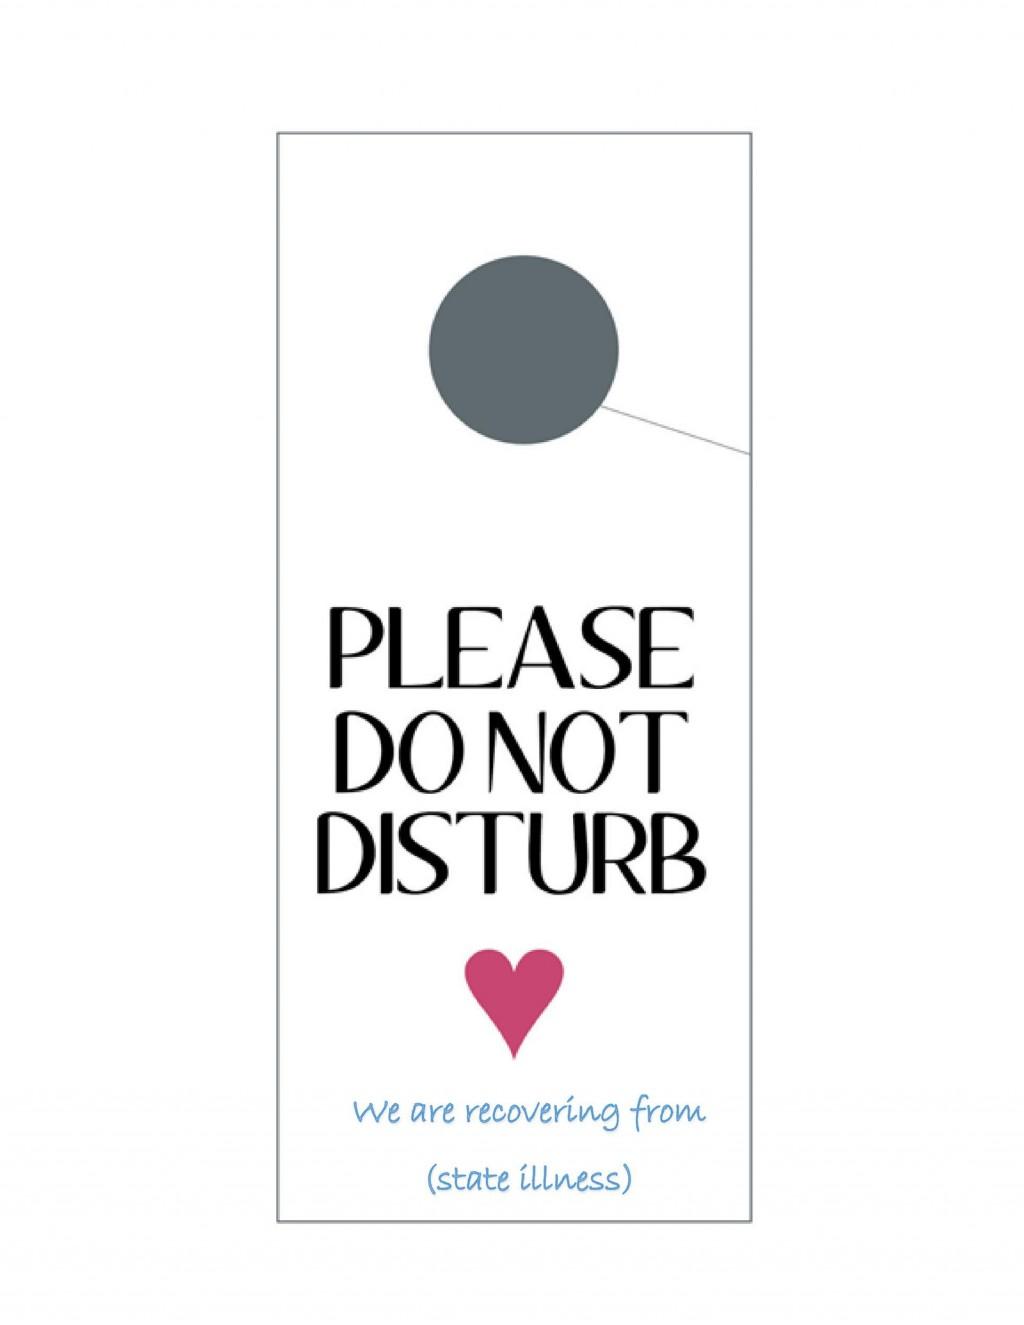 004 Outstanding Free Printable Template For Door Hanger Photo Large